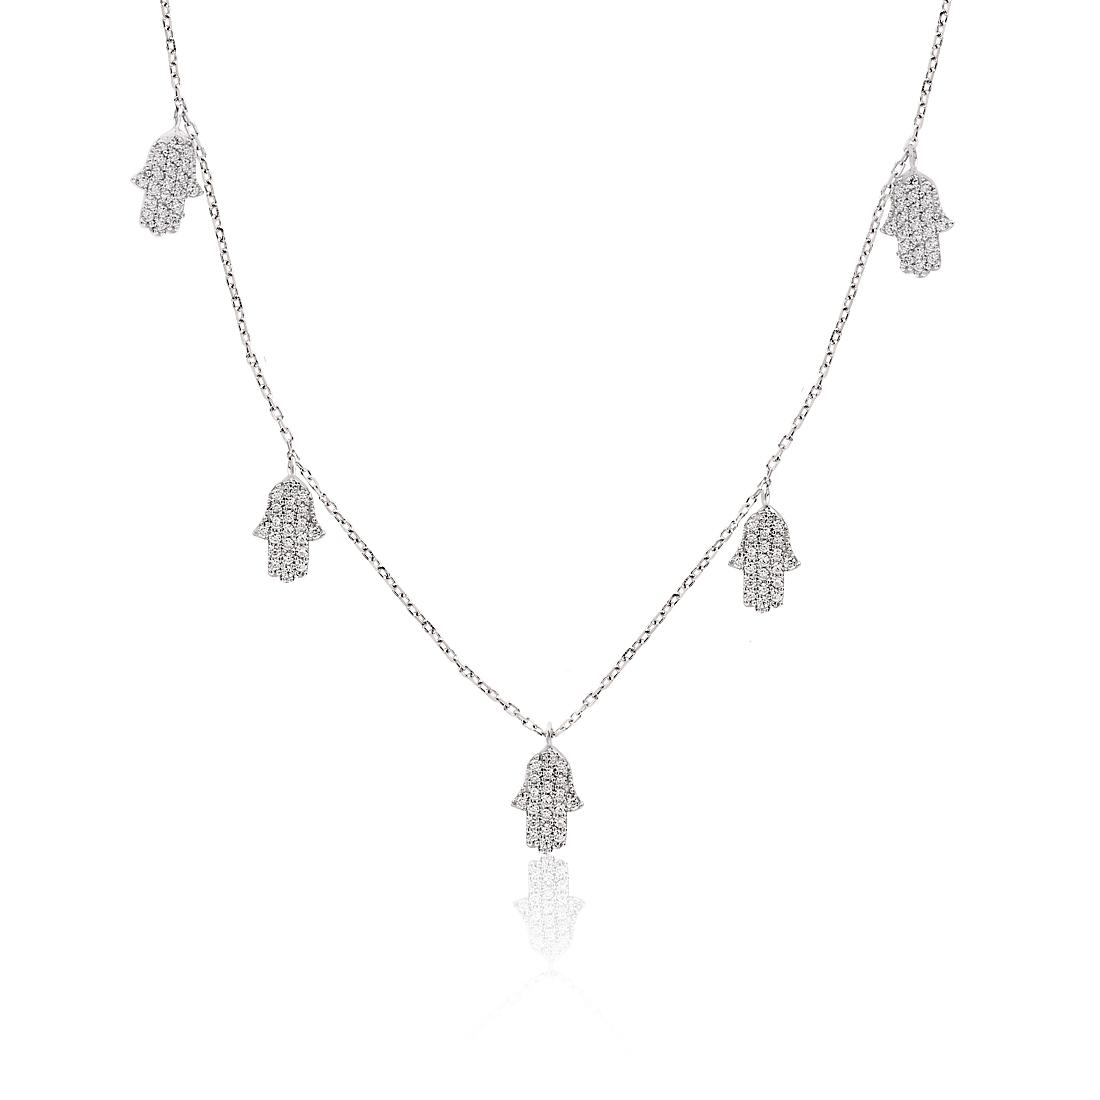 Waw Hand Khailo Silver Necklace - High Street Jewelry